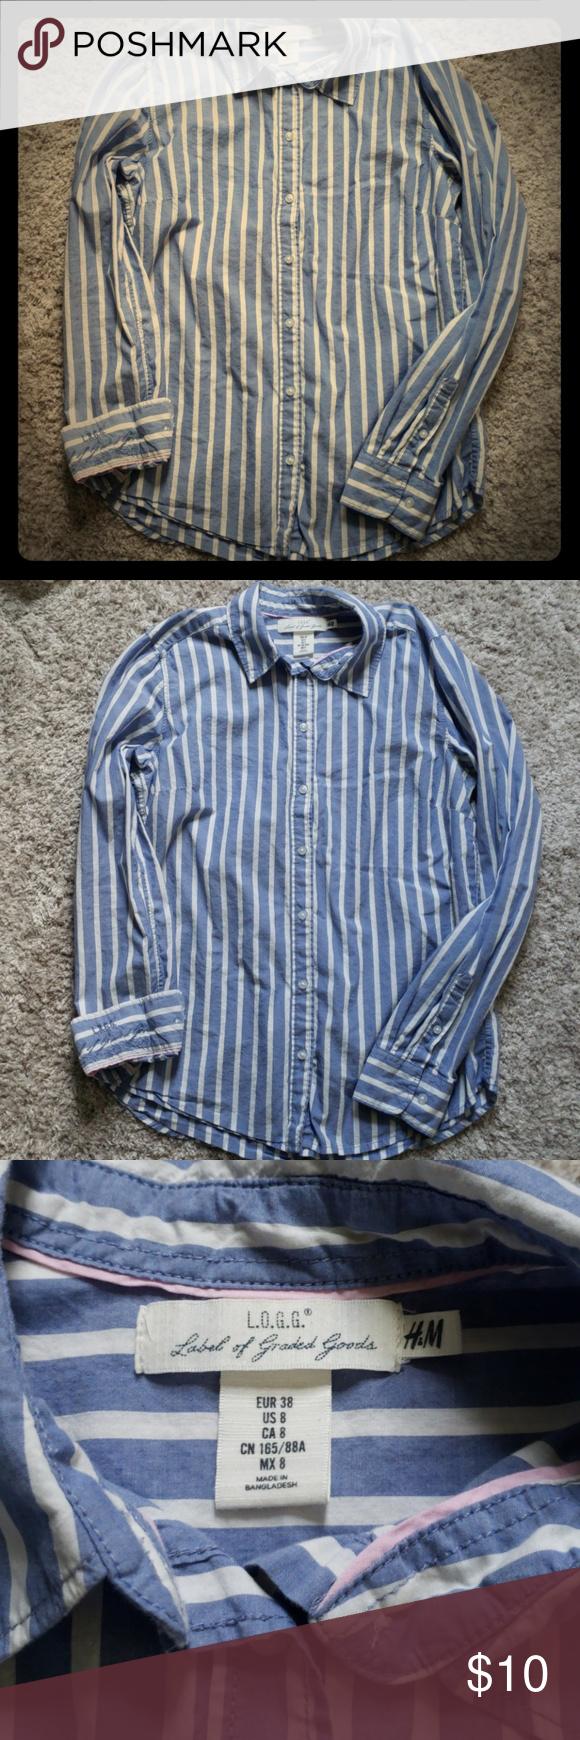 7d760ca2c8 H&M L.O.G.G. button down shirt Size 8 H&M L.O.G.G. button down shirt ...